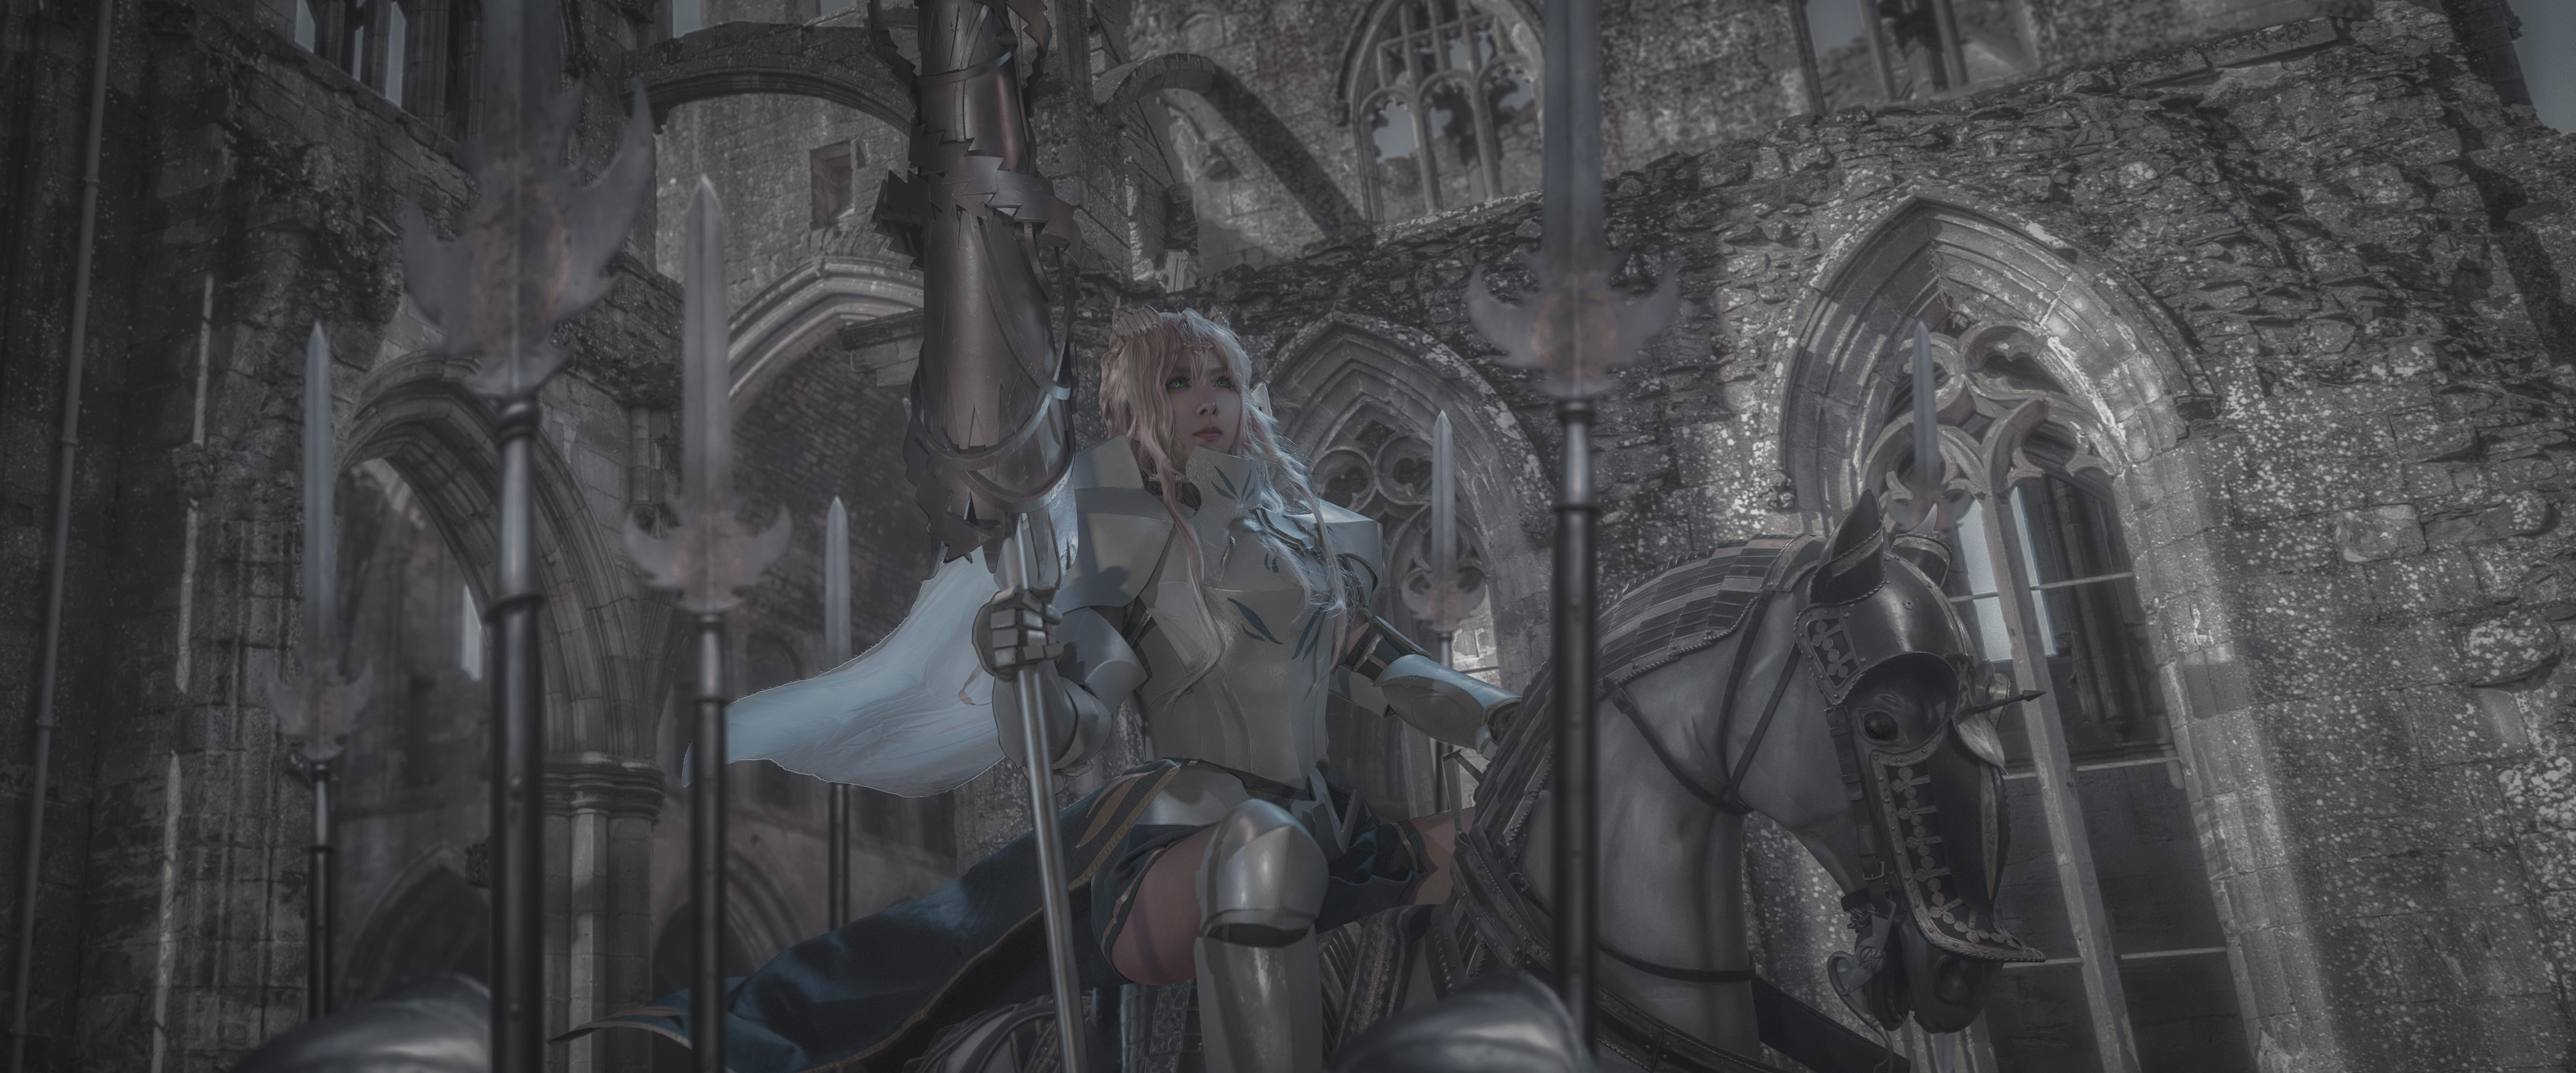 《FATE/ZERO》正片cosplay【CN:艾斯诺提伽】-第2张